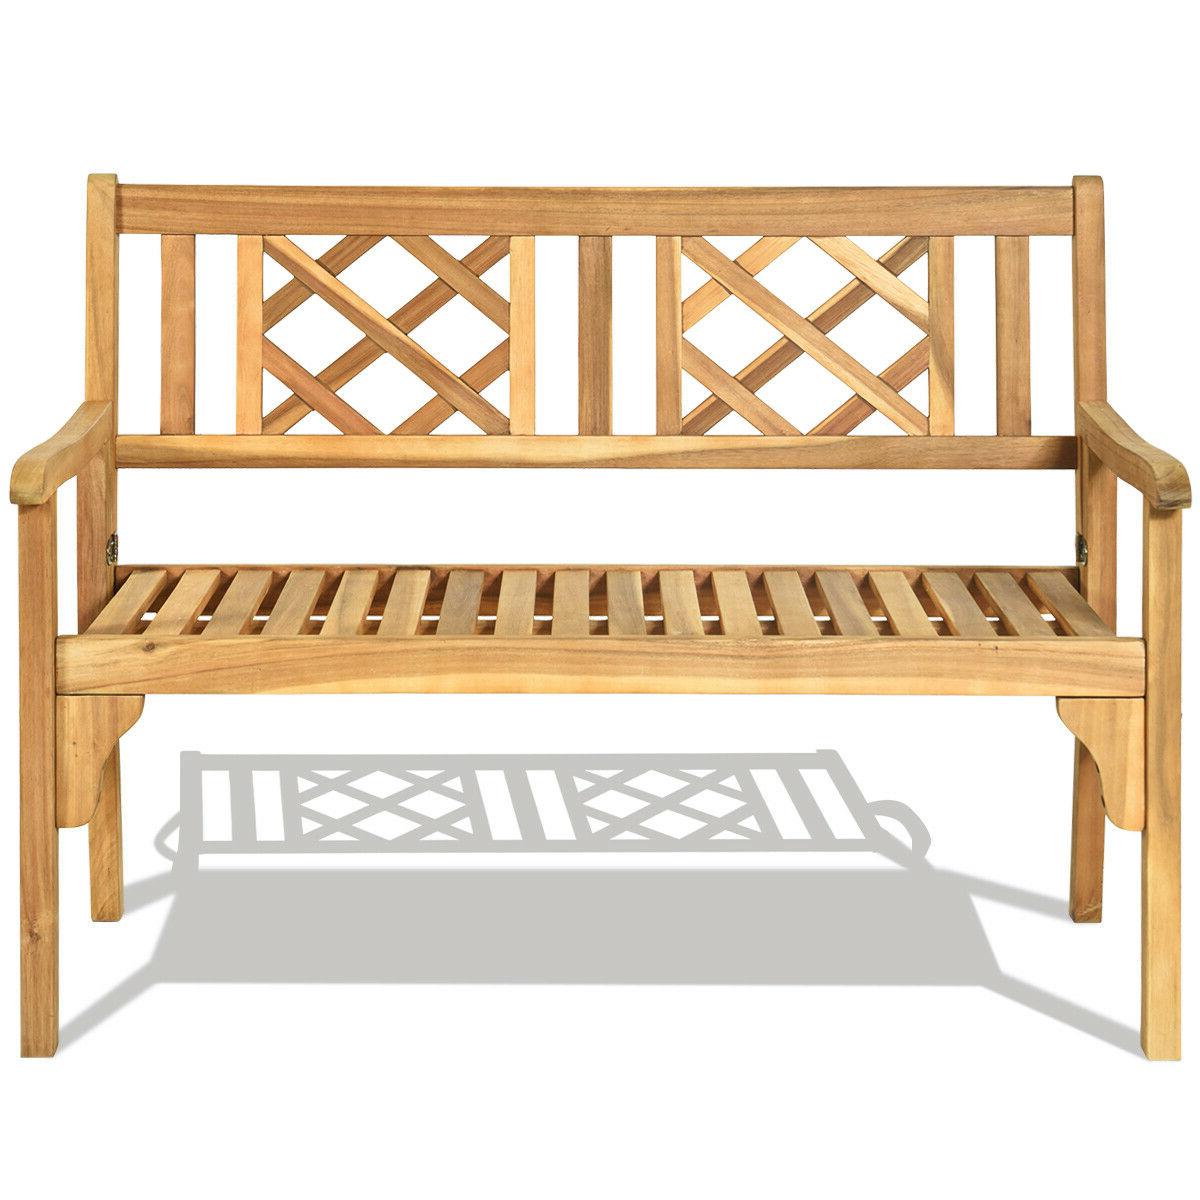 Patio Outdoor Acacia Wood Bench Folding Loveseat Chair Garden Furniture Teak Inside 2019 Hampstead Heath Teak Garden Benches (View 18 of 30)